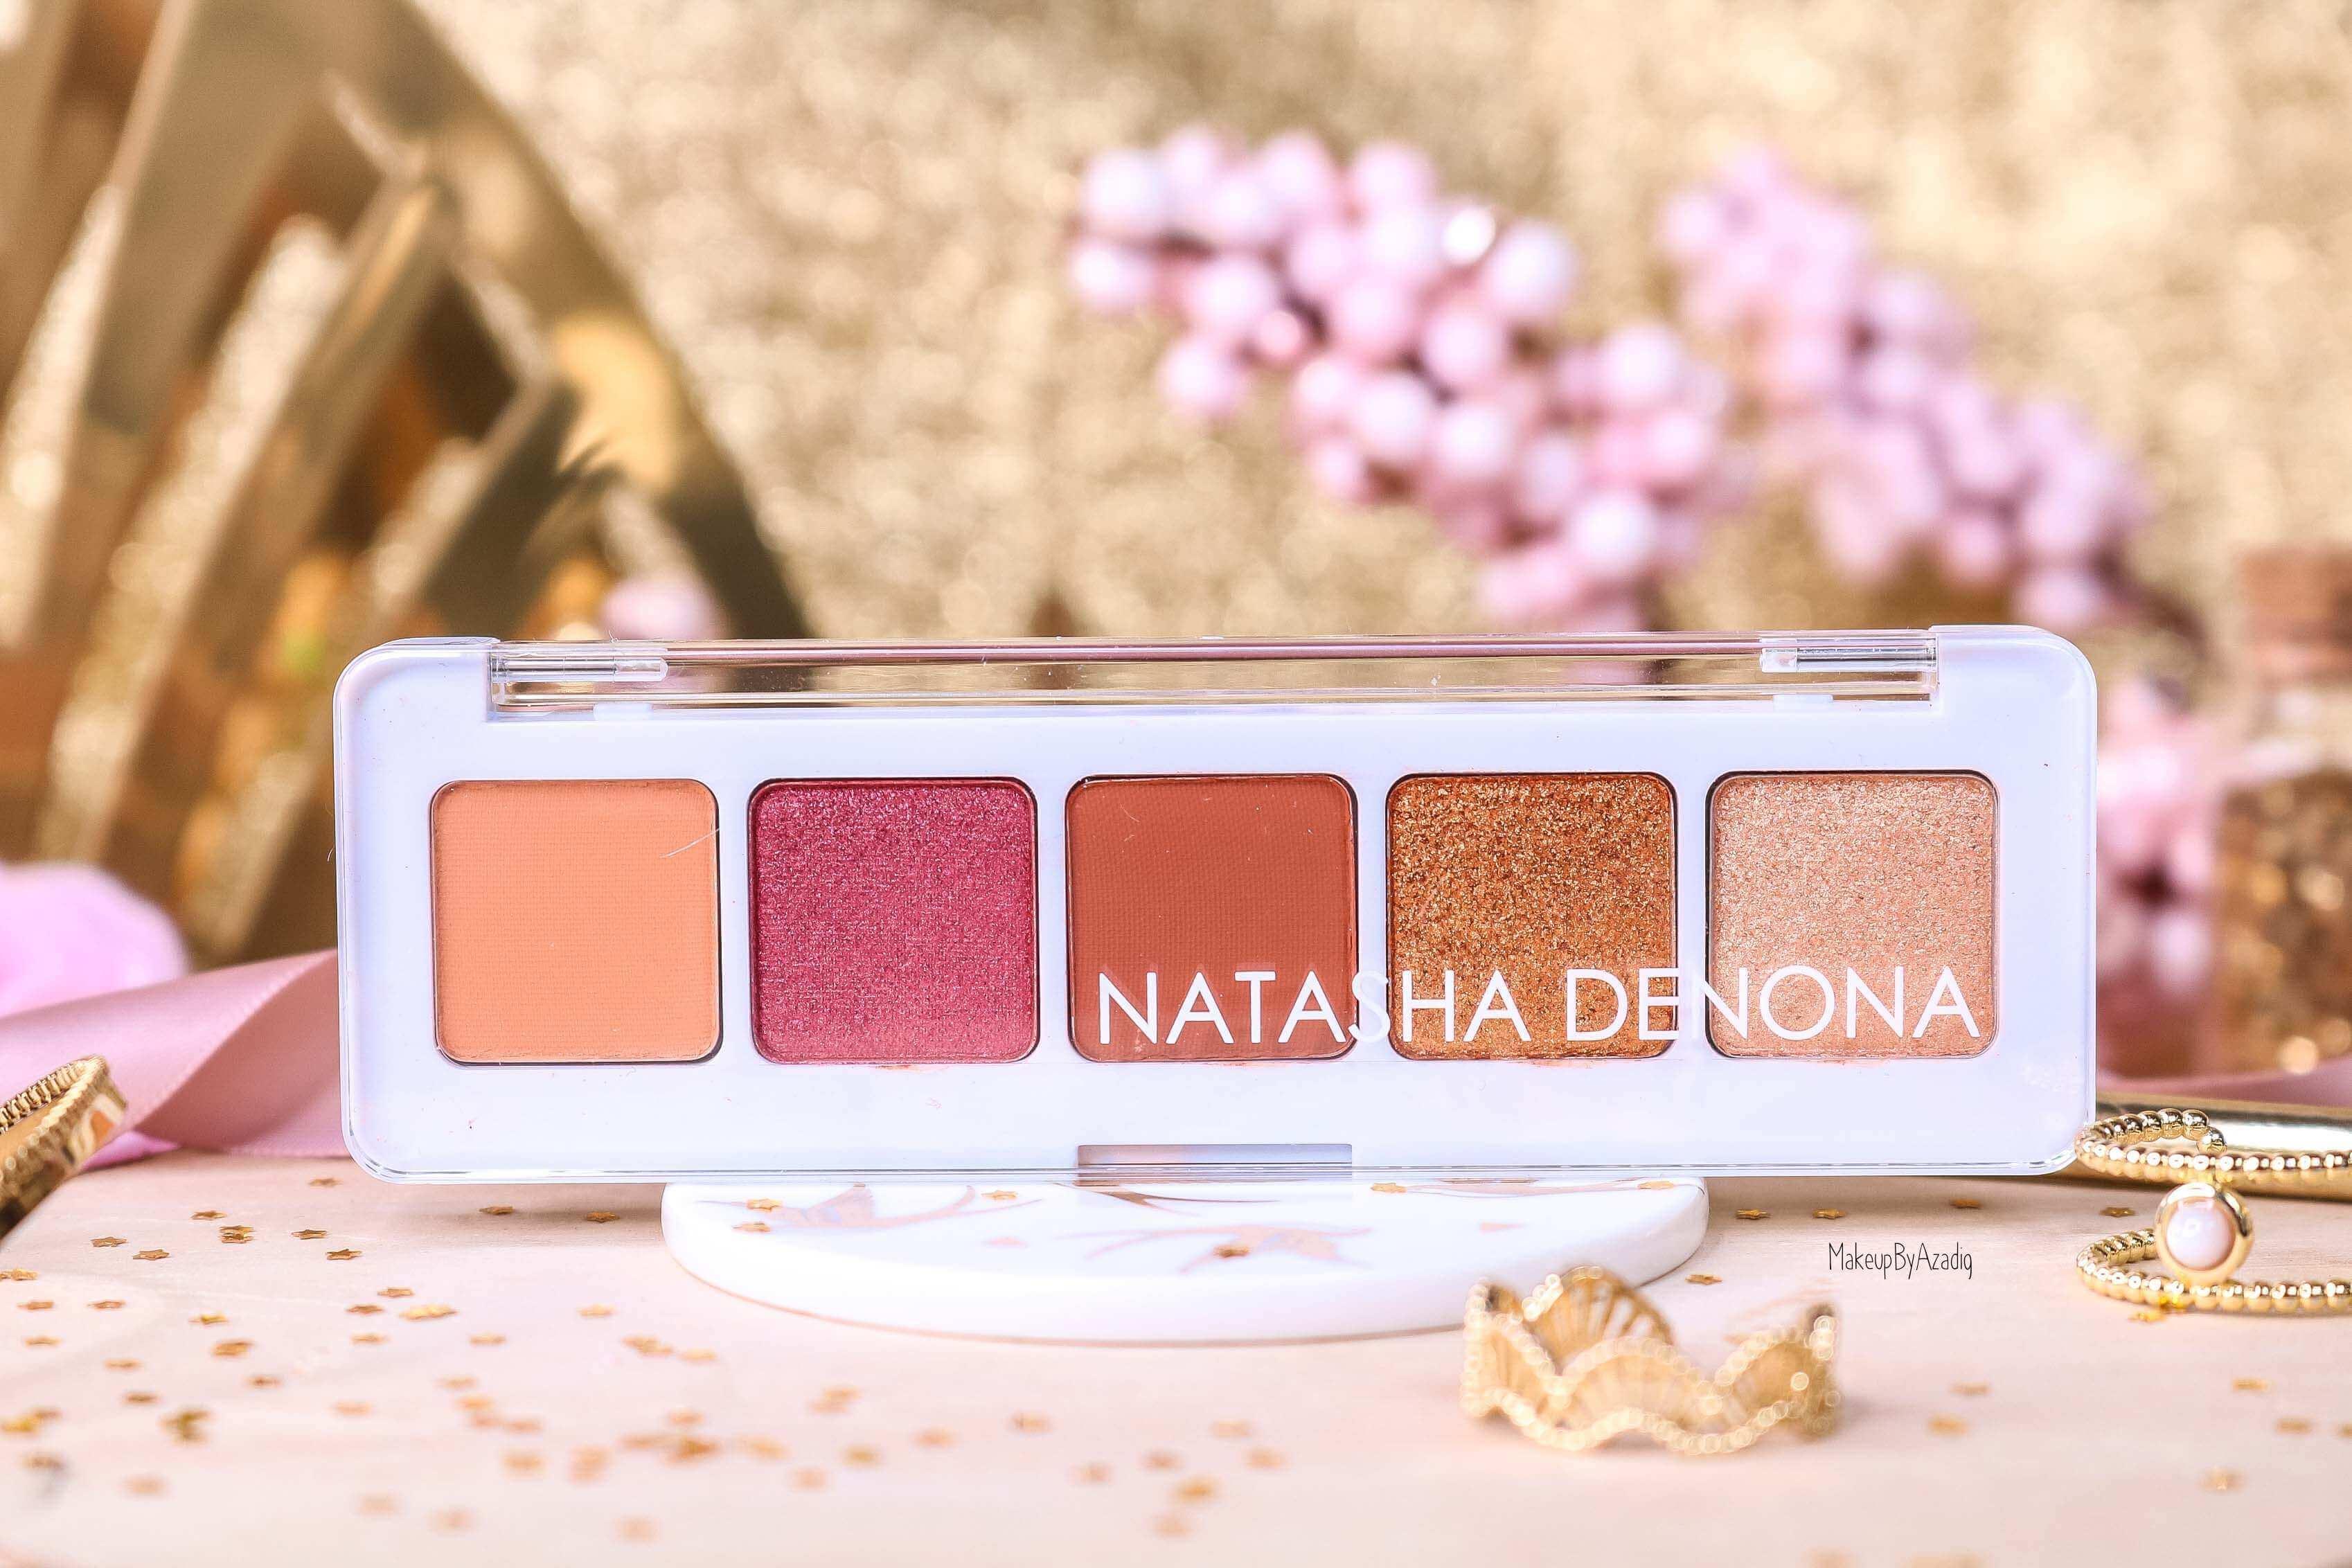 revue-palette-mini-sunset-natasha-denona-sephora-france-avis-prix-swatch-gold-champagne-burgundy-makeupbyazadig-eyeshadow-couleurs